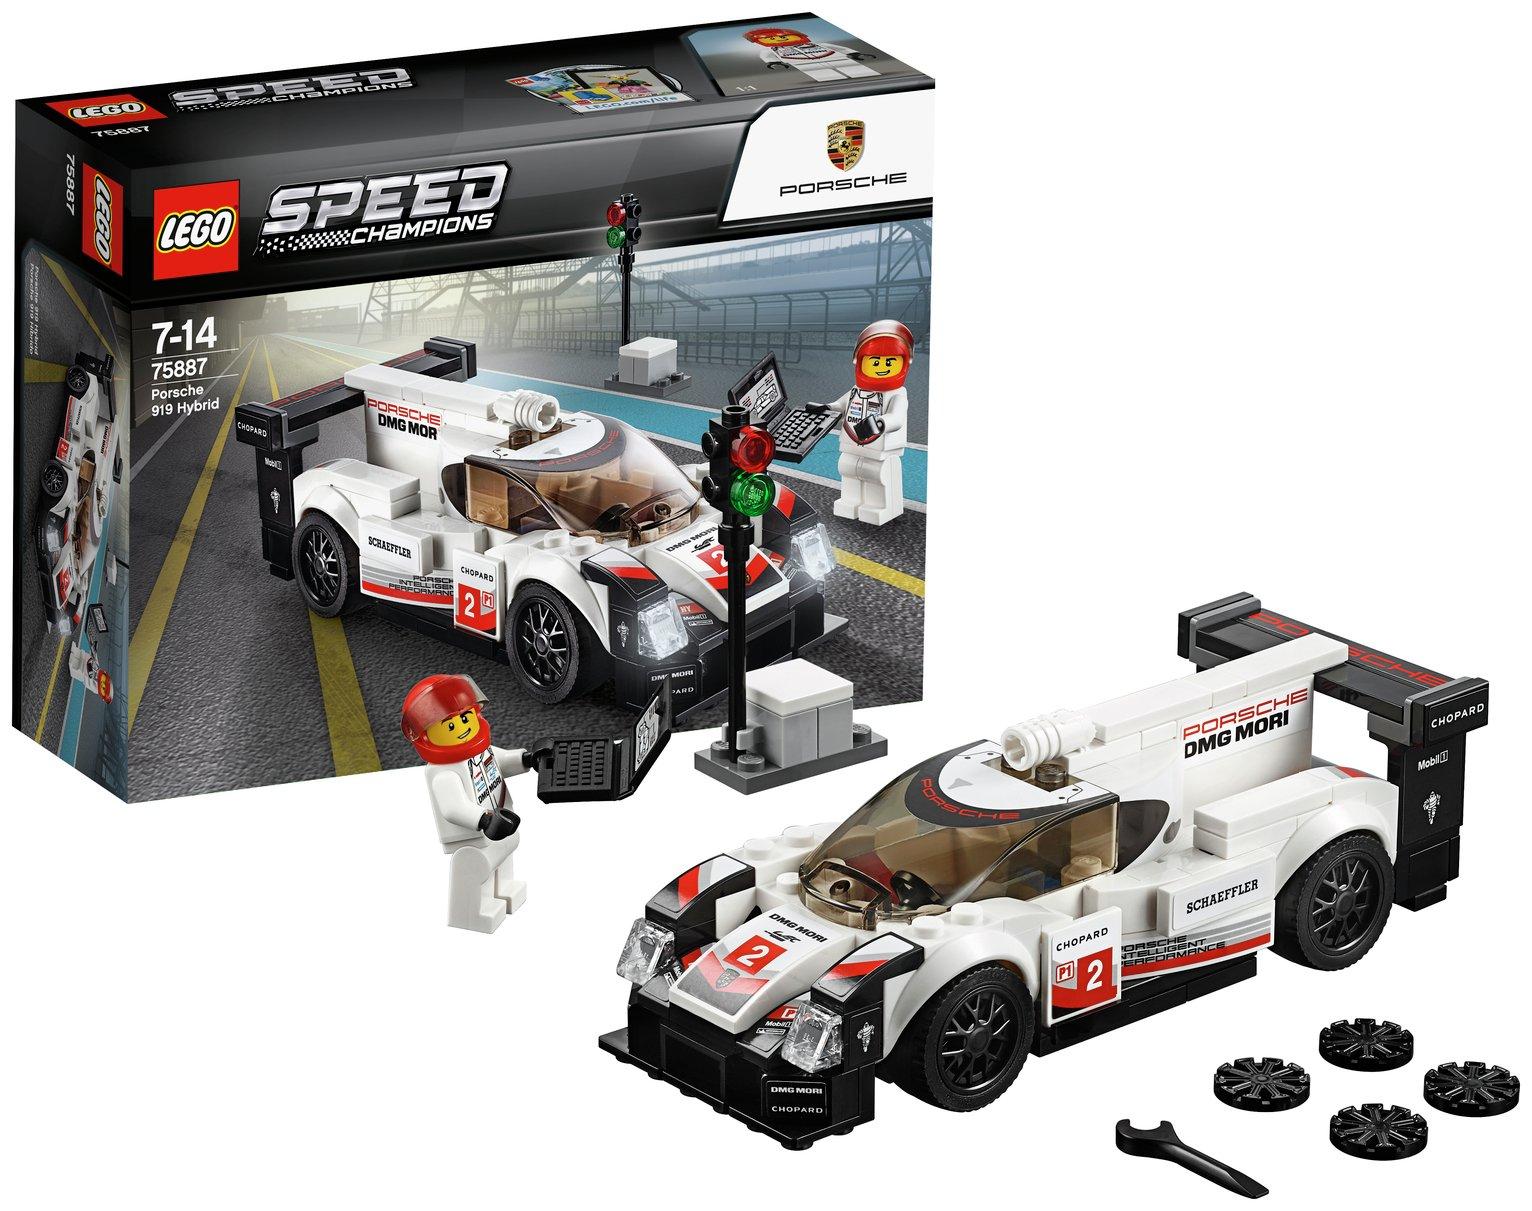 Image of LEGO Speed Champions Porsche 919 Hybrid - 75887